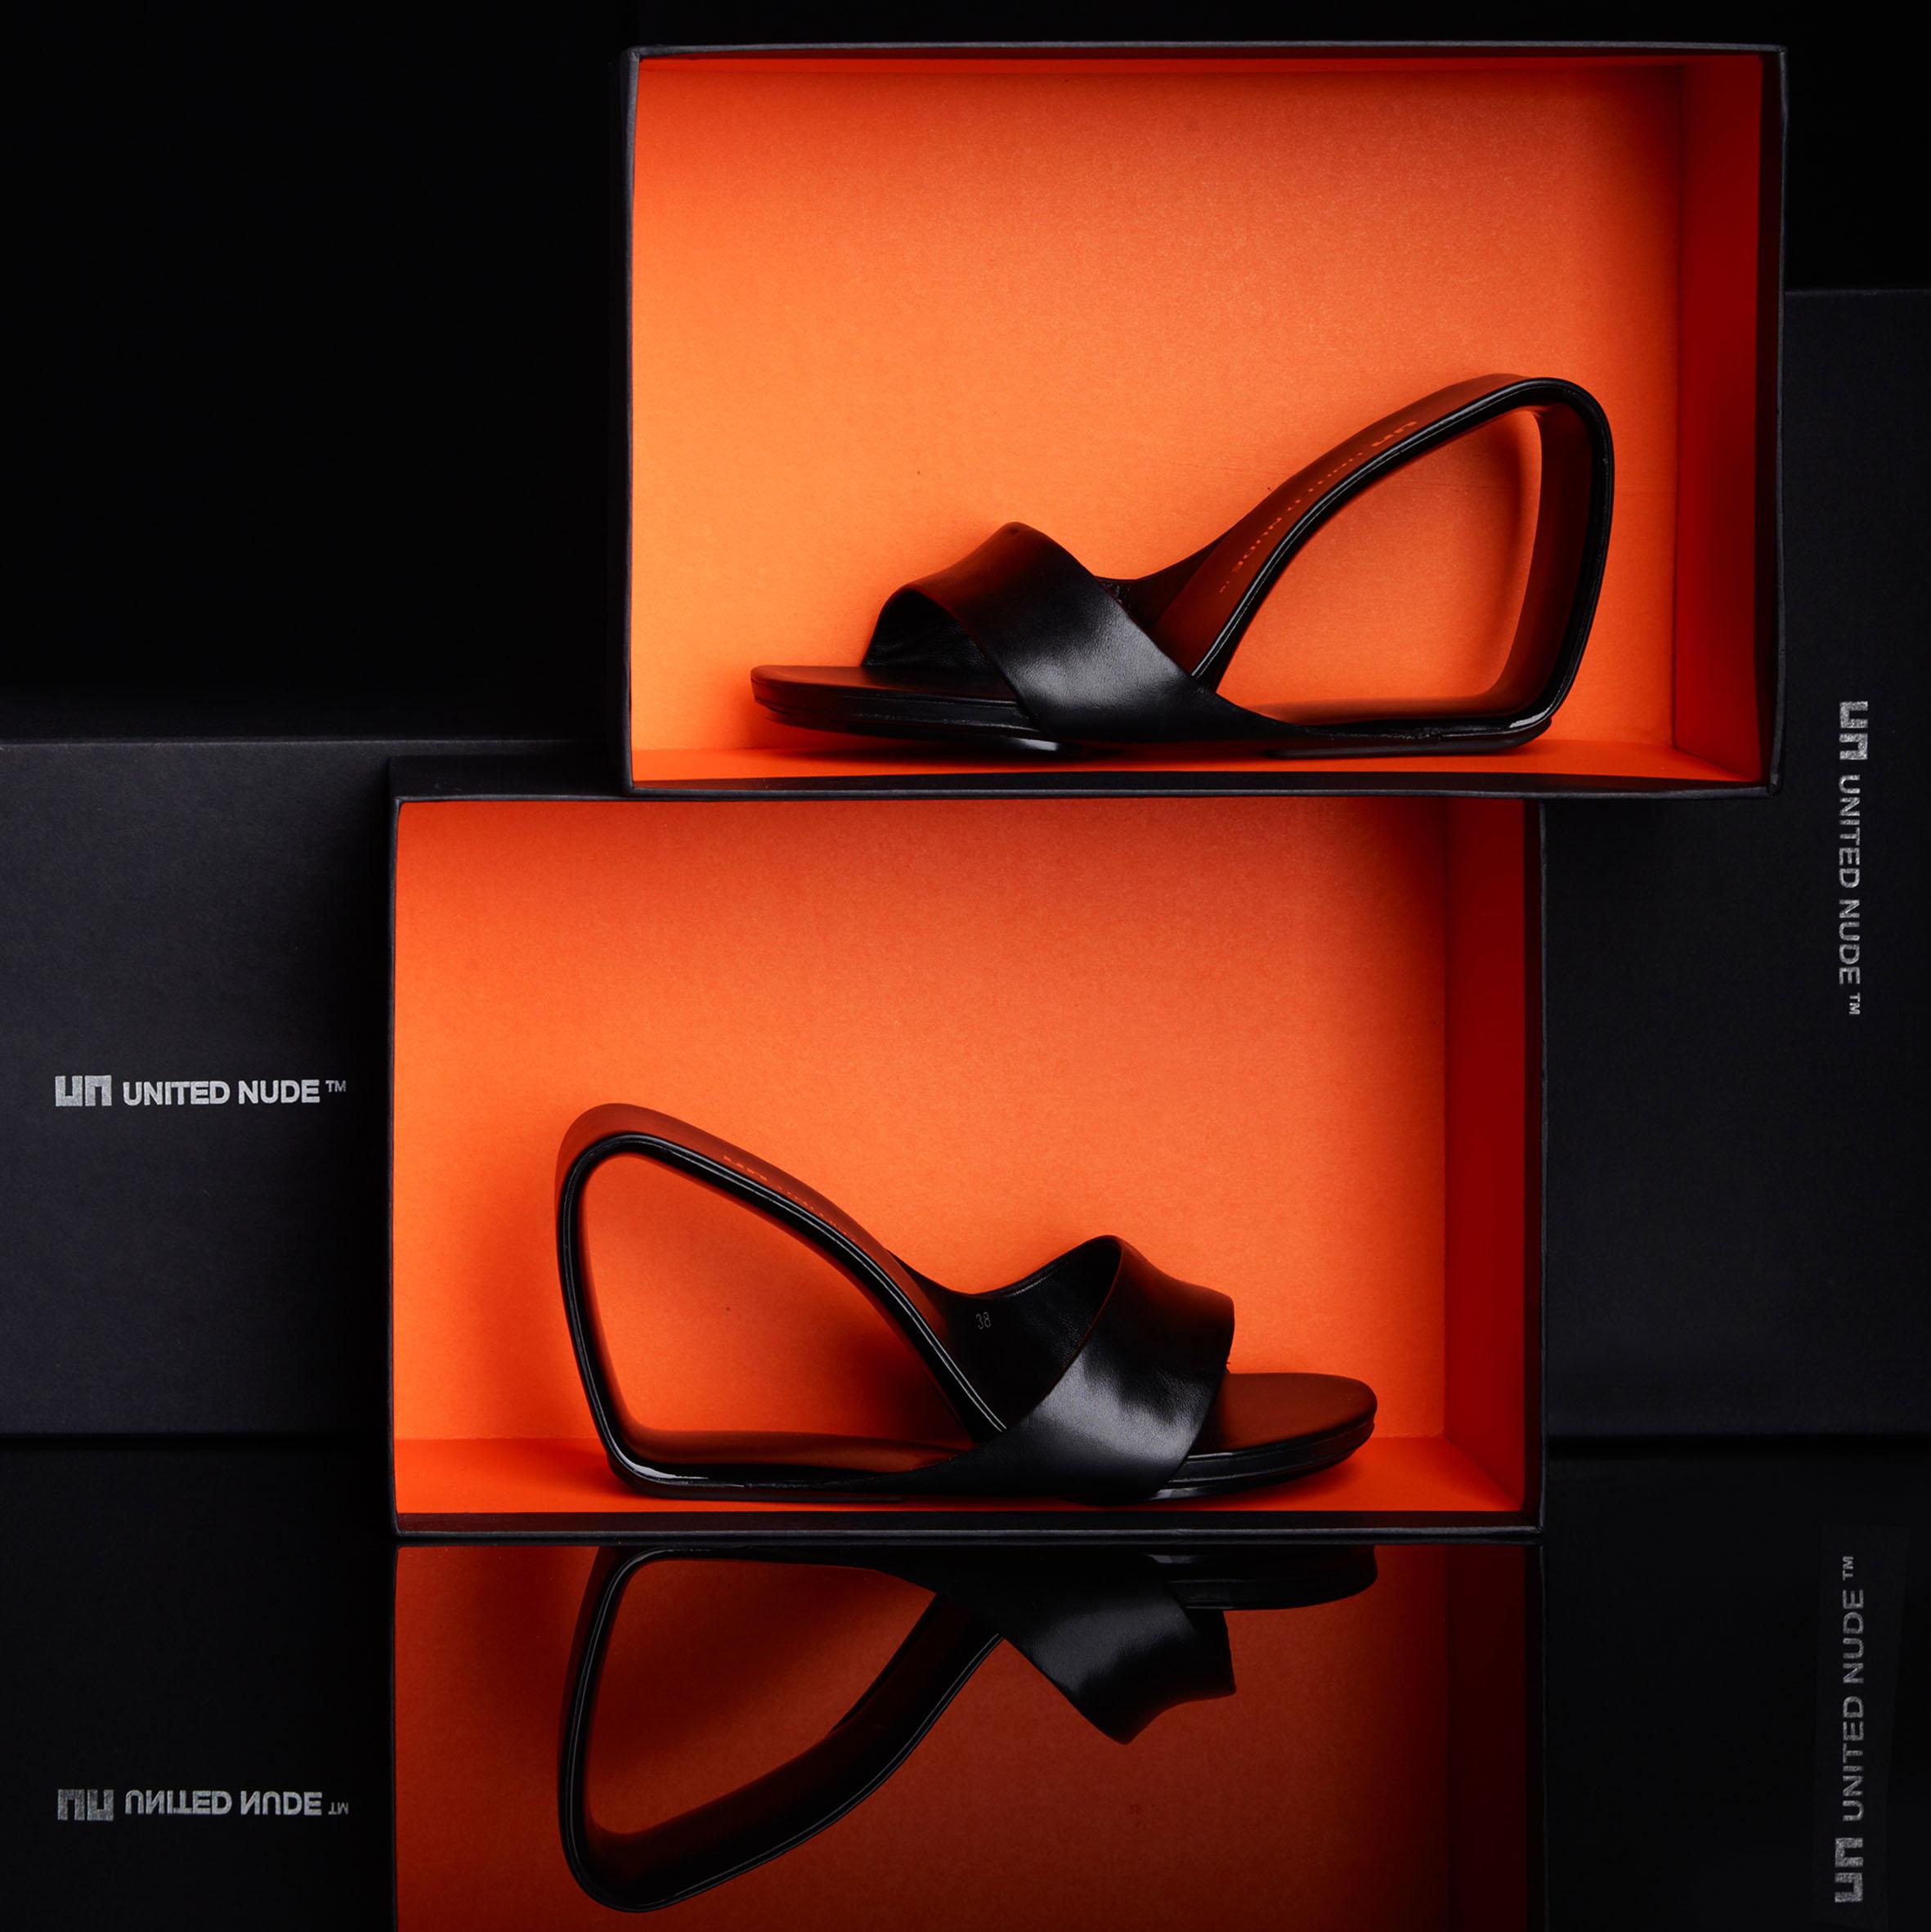 Schuhe | Studio-51 | Studio51 | Studio 51 | Werbefotografie | Fotostudio | Studiofotografie | Produktshooting | Produktfotos